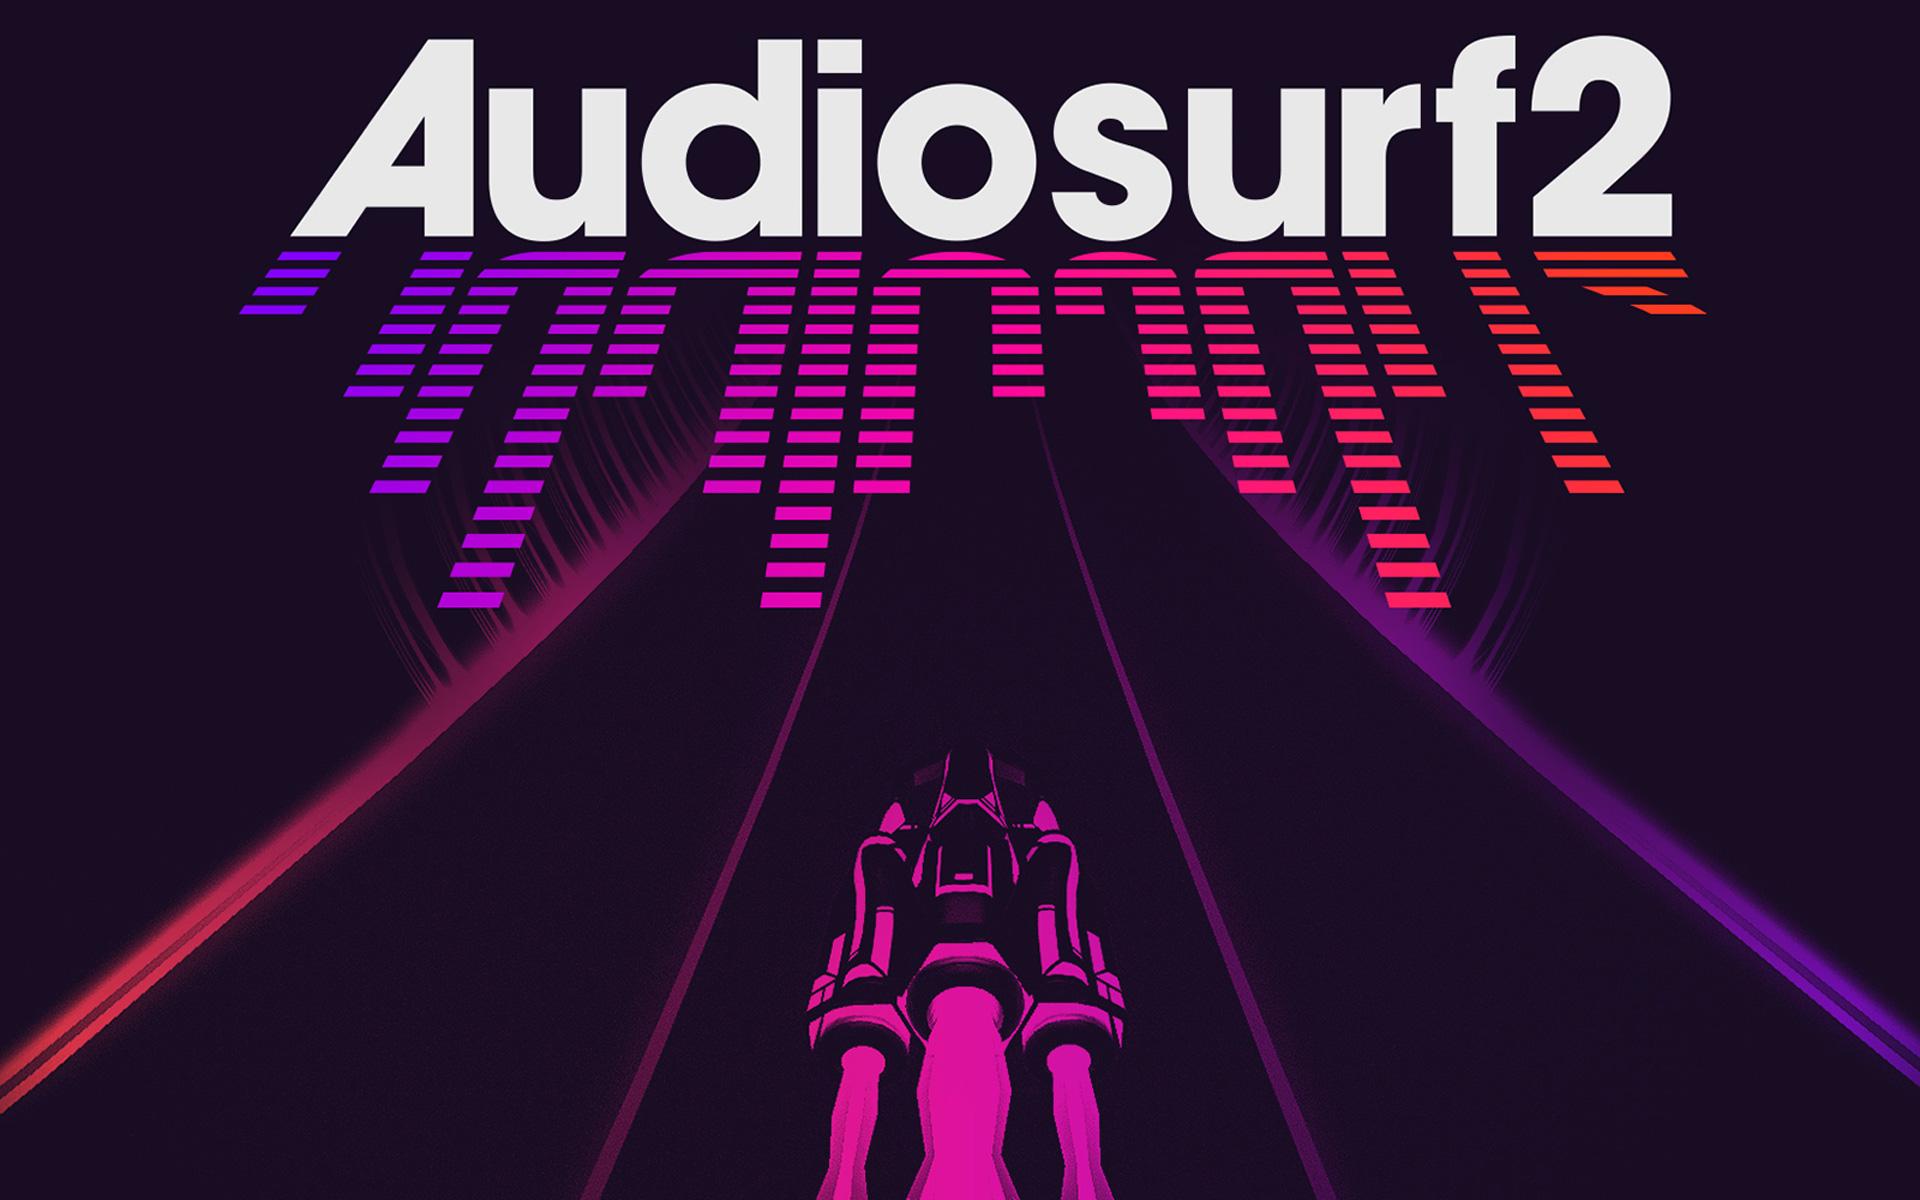 Free Audiosurf 2 Wallpaper in 1920x1200